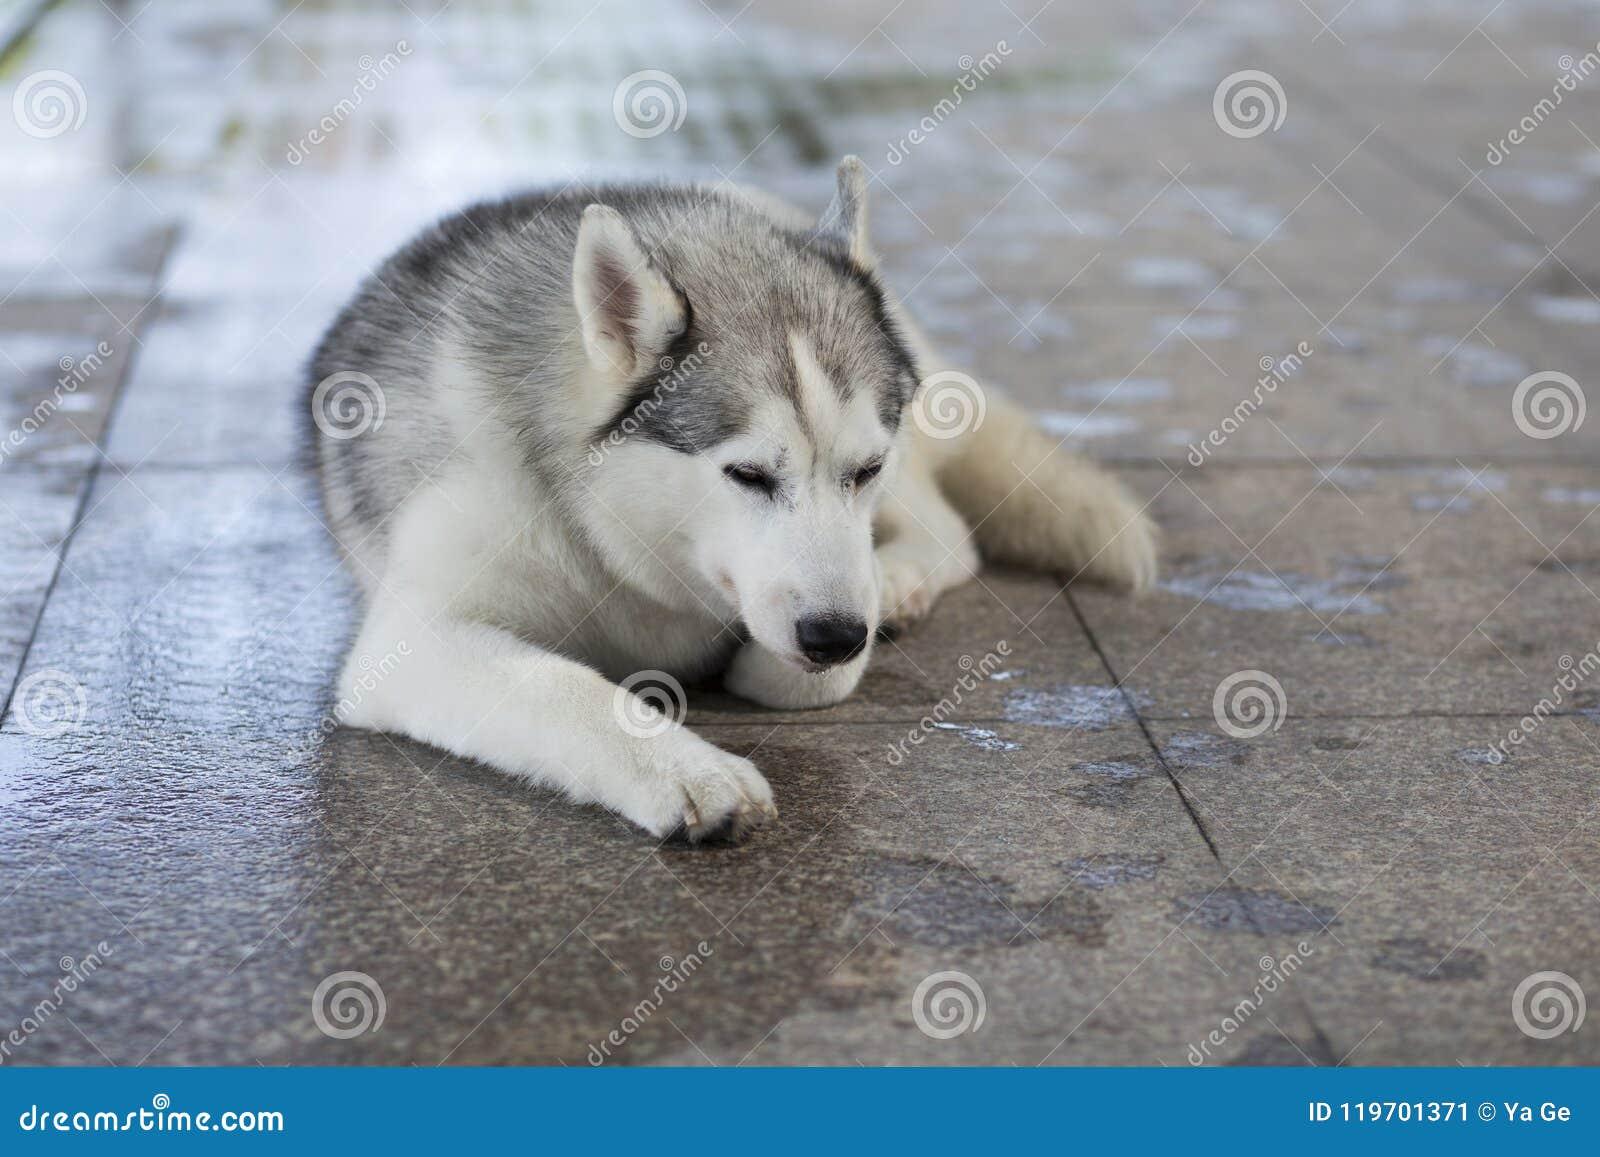 Siberian Husky Dog Stock Image Image Of Silly Siberia 119701371